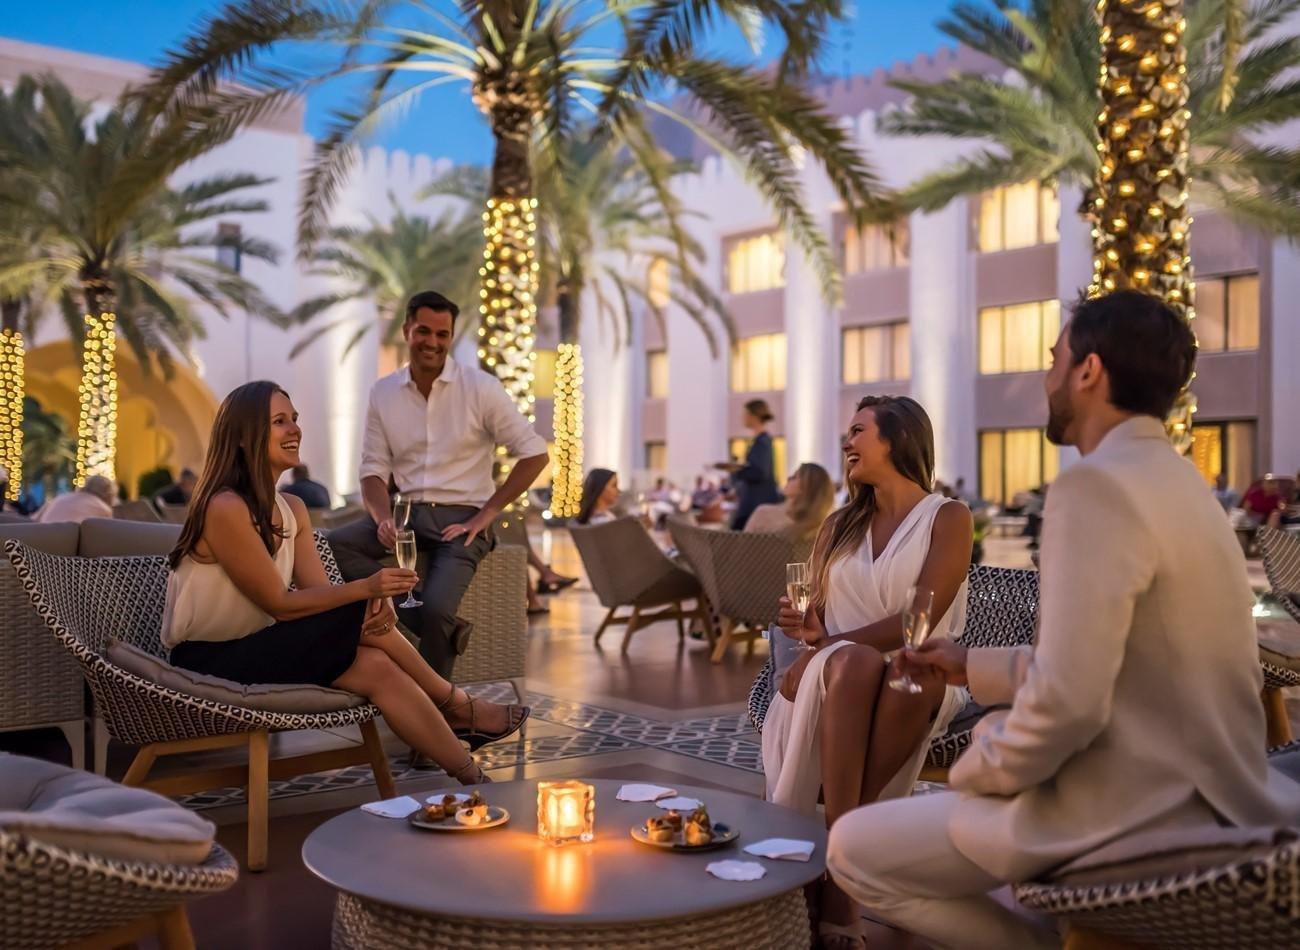 Hotel Shangri-La Al Husn pre-dinner drinks op het terras - Muscat